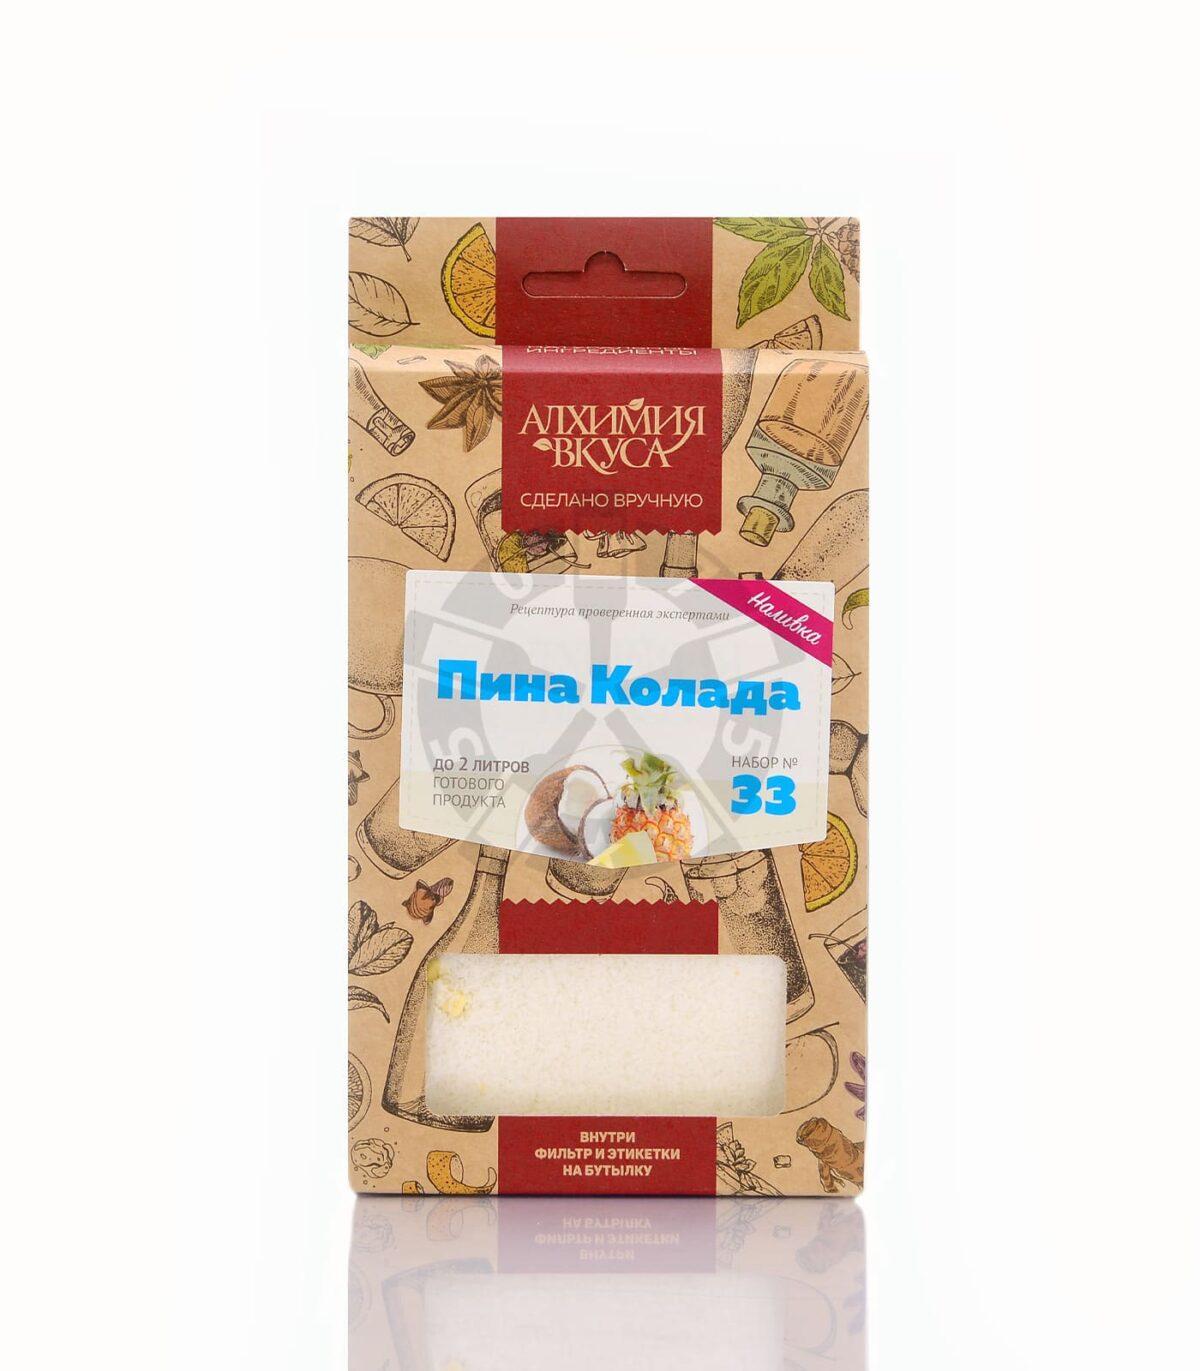 Пина Колада - набор для приготовления наливки